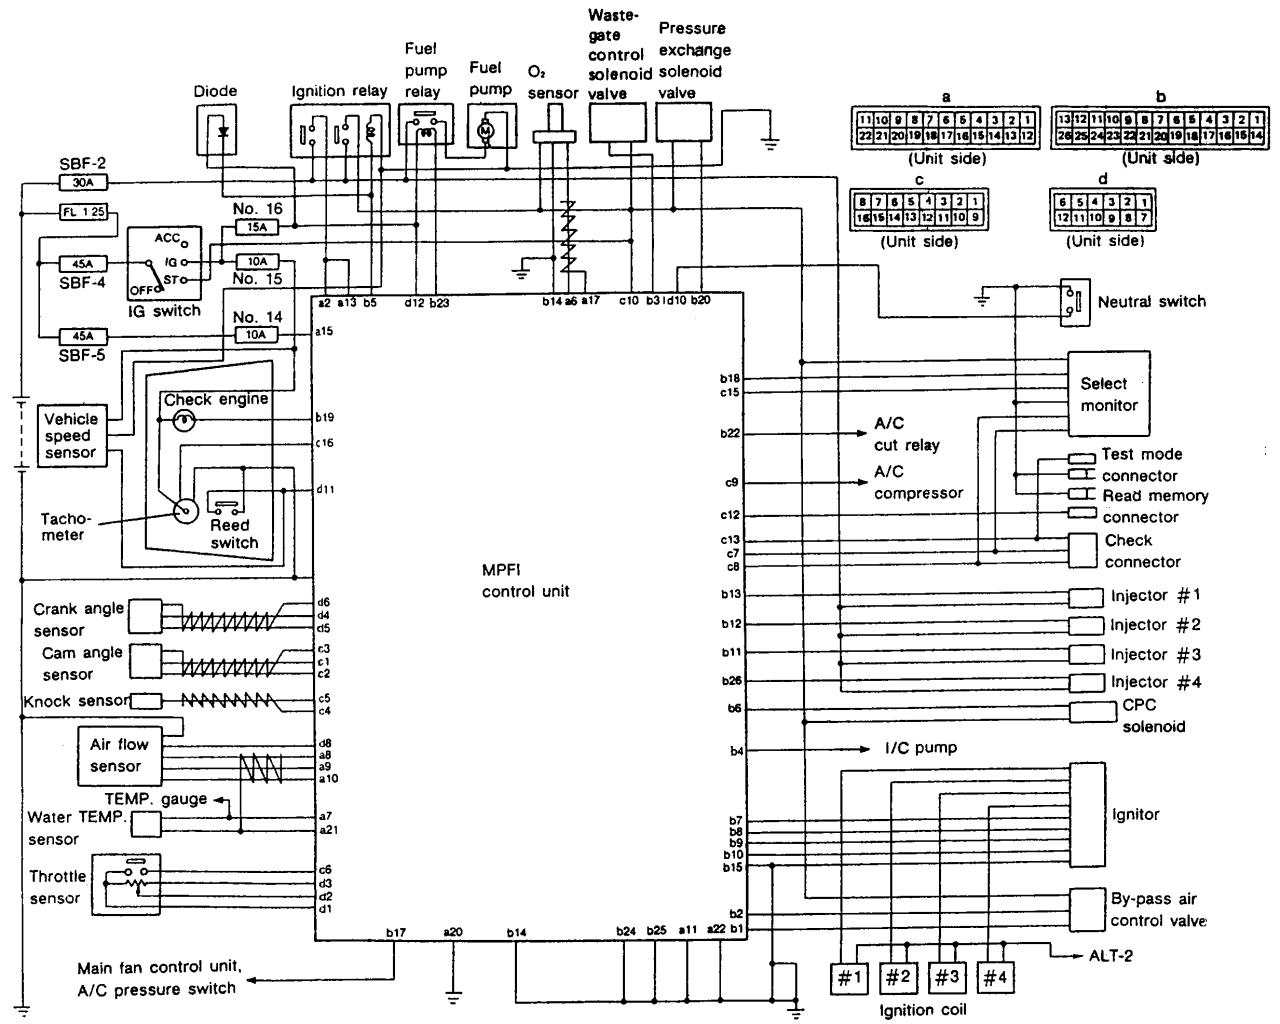 2001 subaru outback radio wiring diagram yx 0517  subaru legacy wagon wiring diagram for 91 subaru radio  subaru legacy wagon wiring diagram for